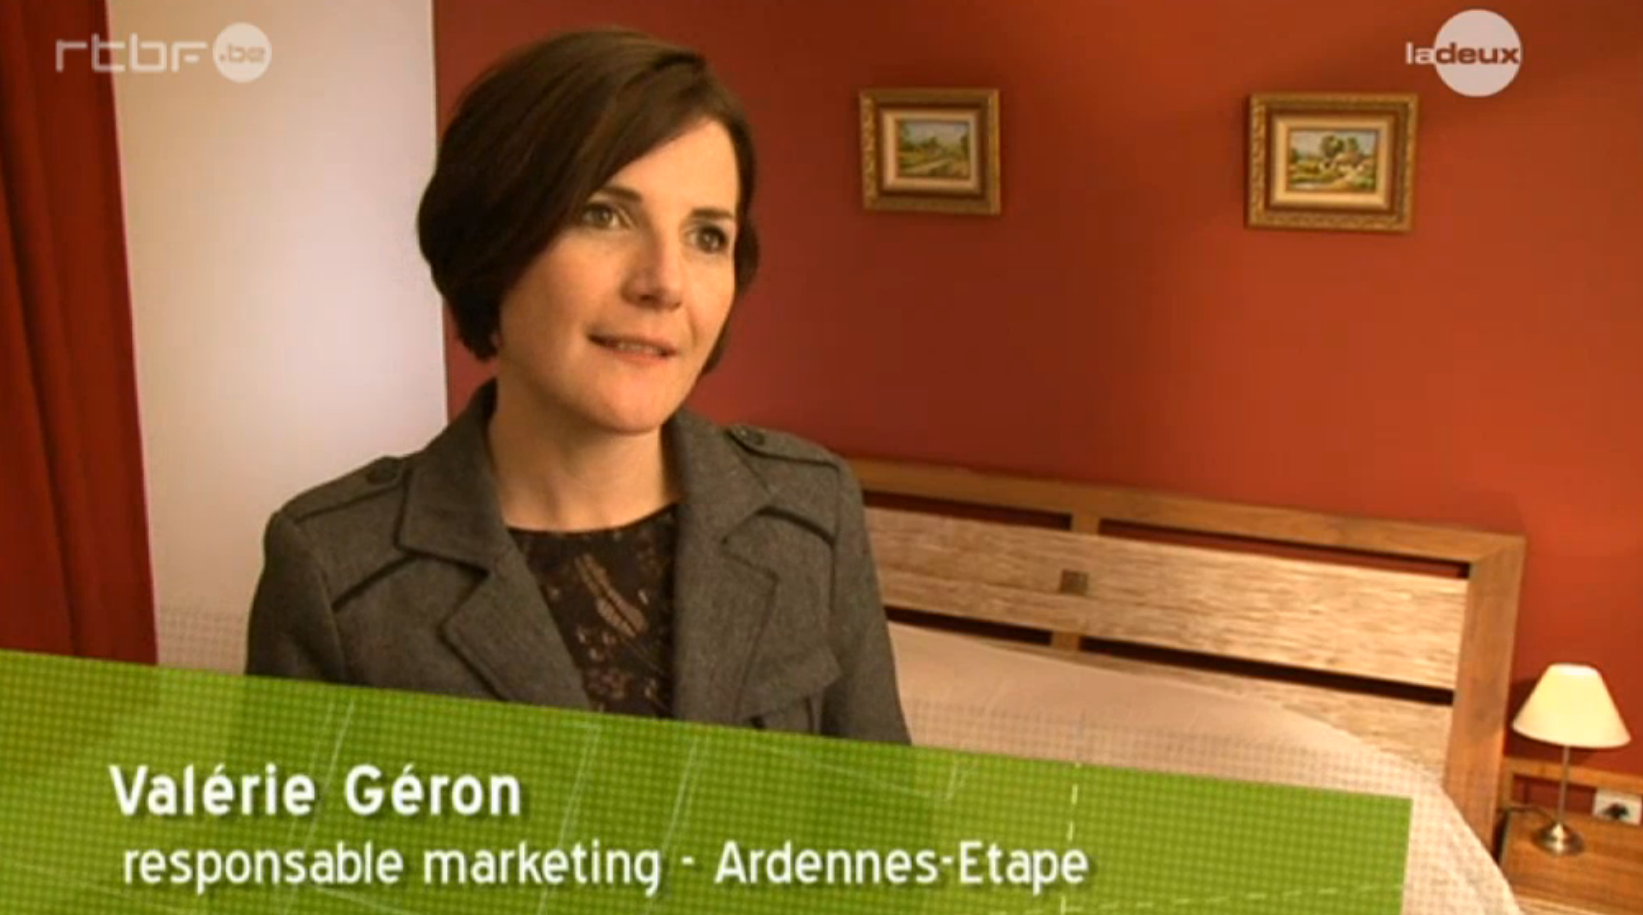 Valérie Geron, marketing & communication manager chez Ardennes-Etape